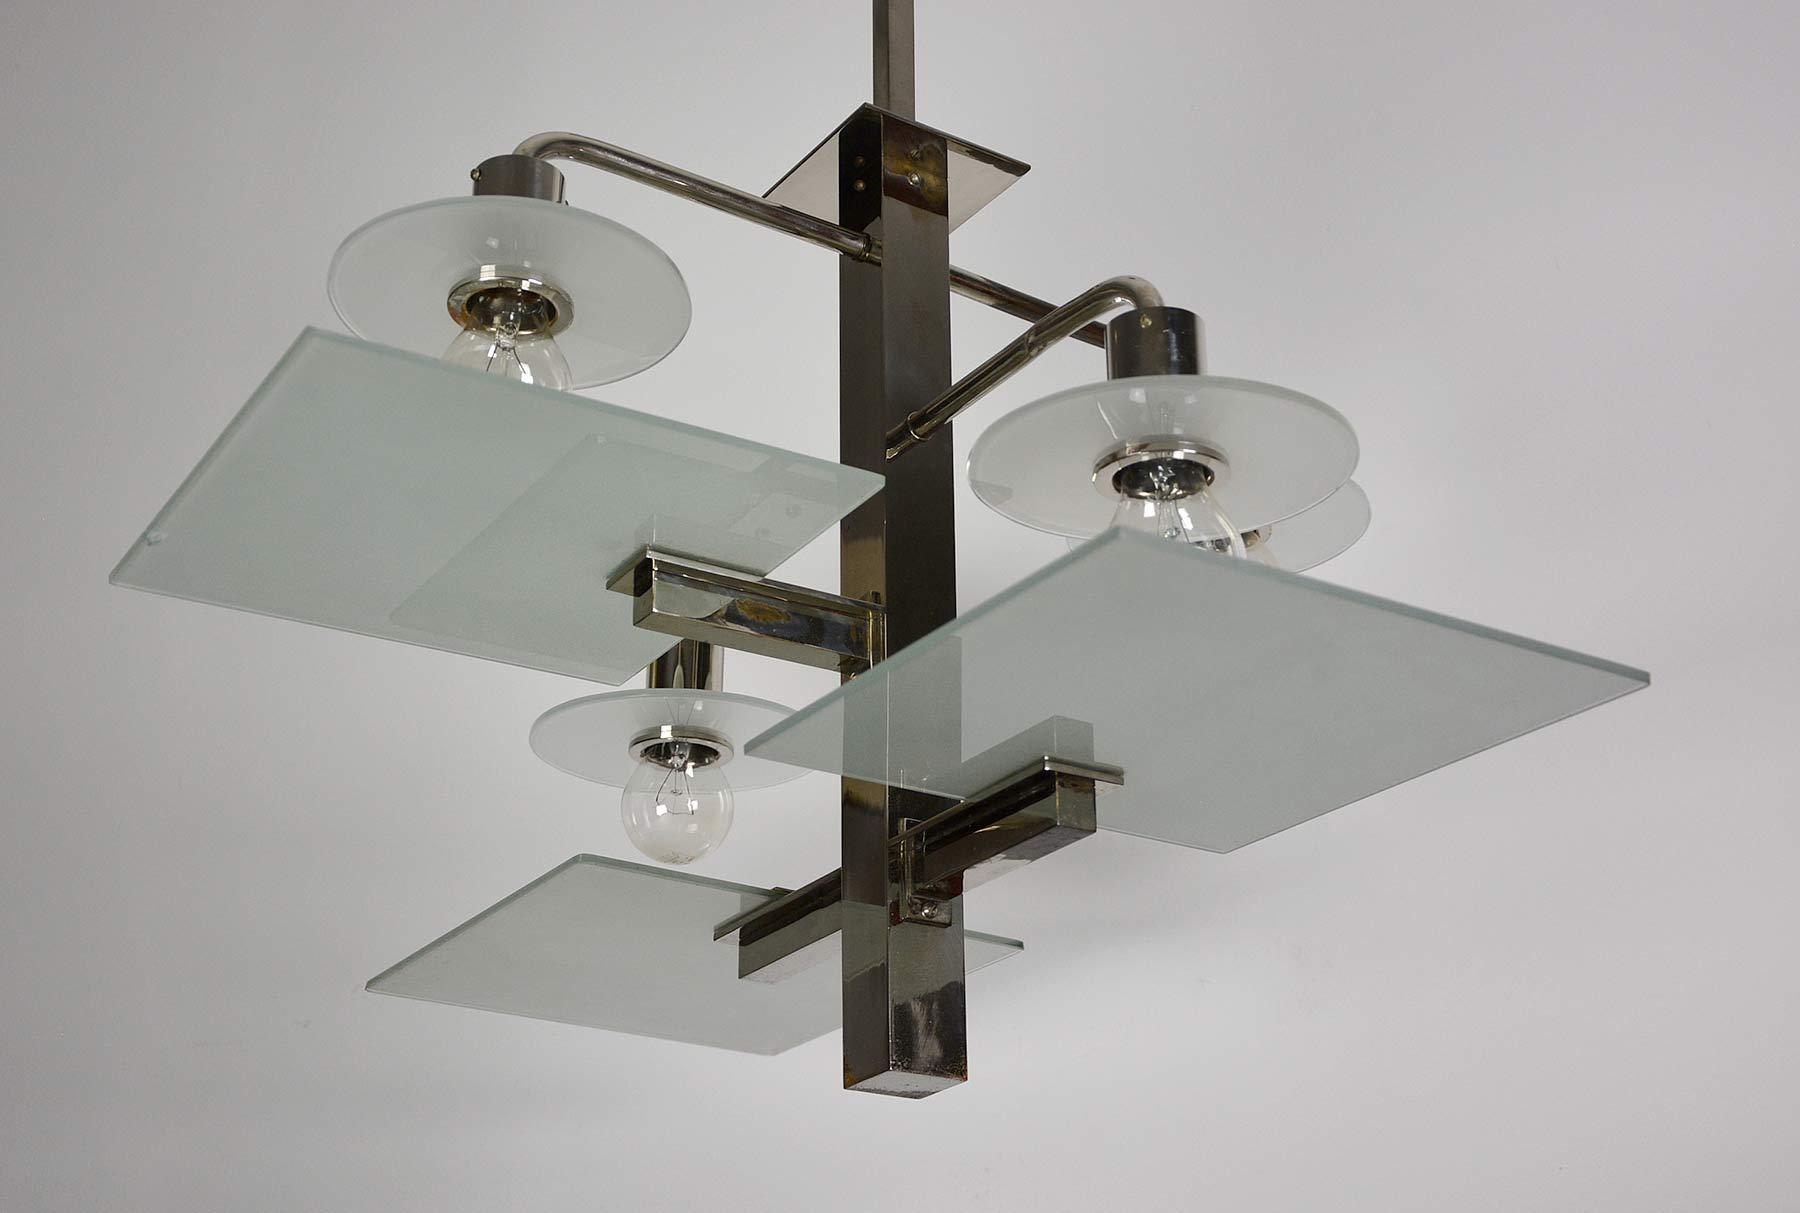 paar bauhaus art deco funktionalismus deckenlampen bakelit. Black Bedroom Furniture Sets. Home Design Ideas